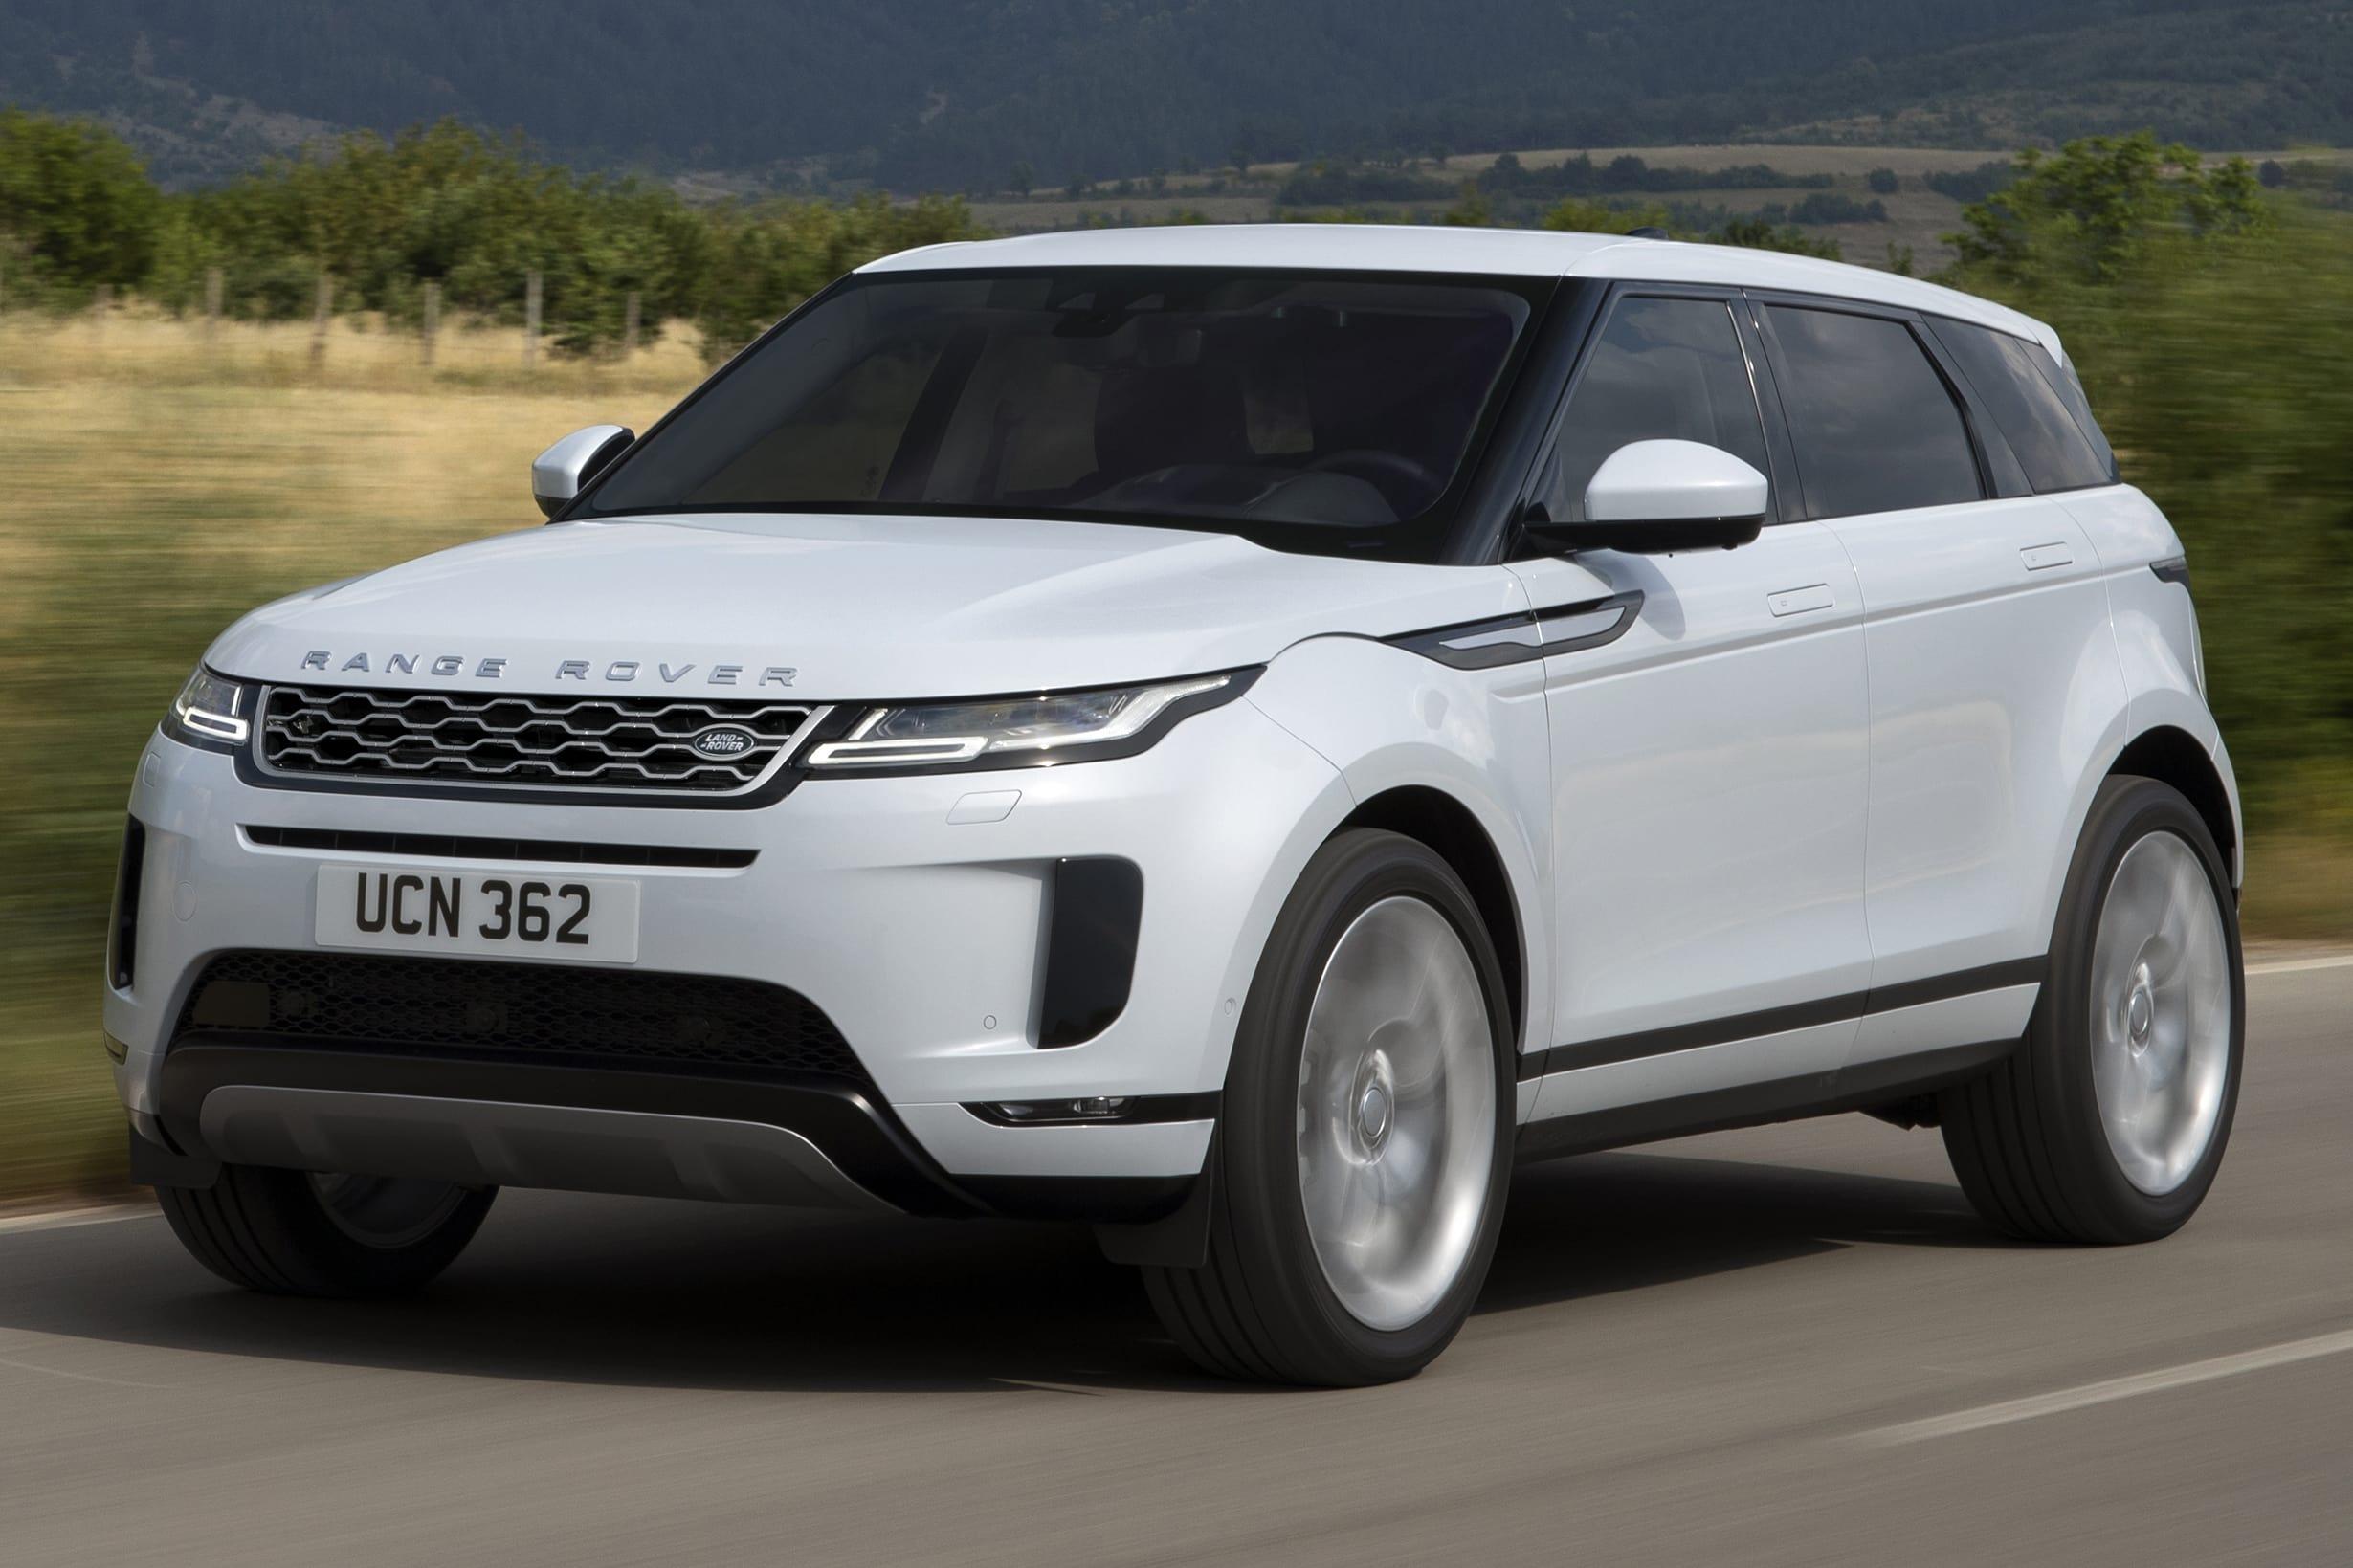 Land Rover Suv >> Range Rover Evoque 2019 Revealed Car News Carsguide